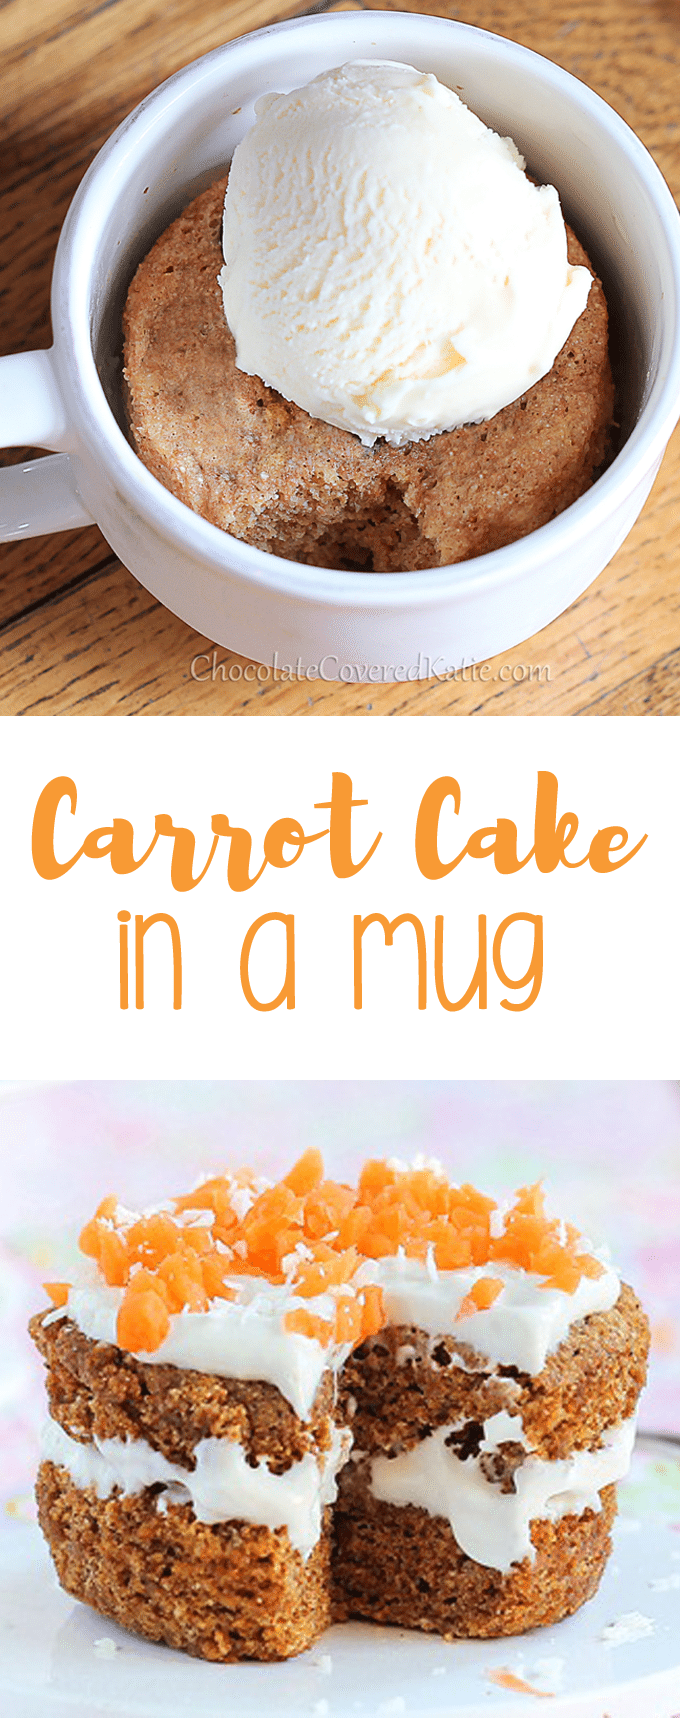 carrot-cake-in-a-mug